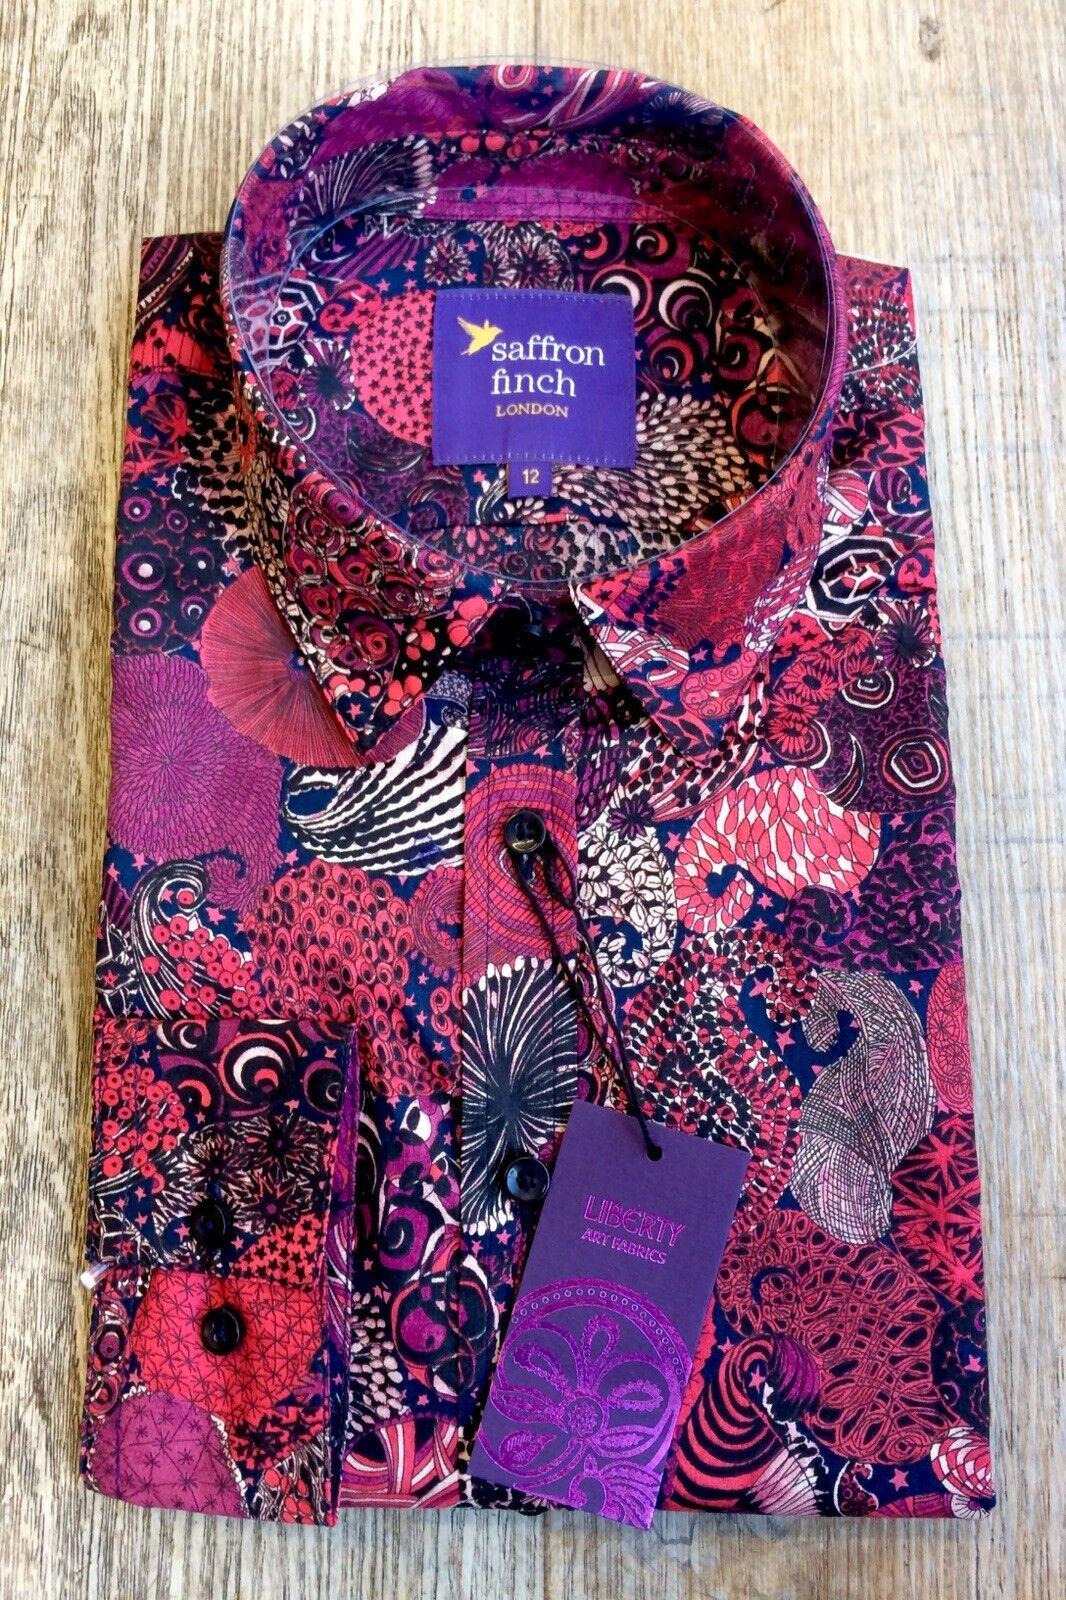 New damen Liberty Print LIMITED EDITION rot Fosil Print Shirt By Saffron Finch.